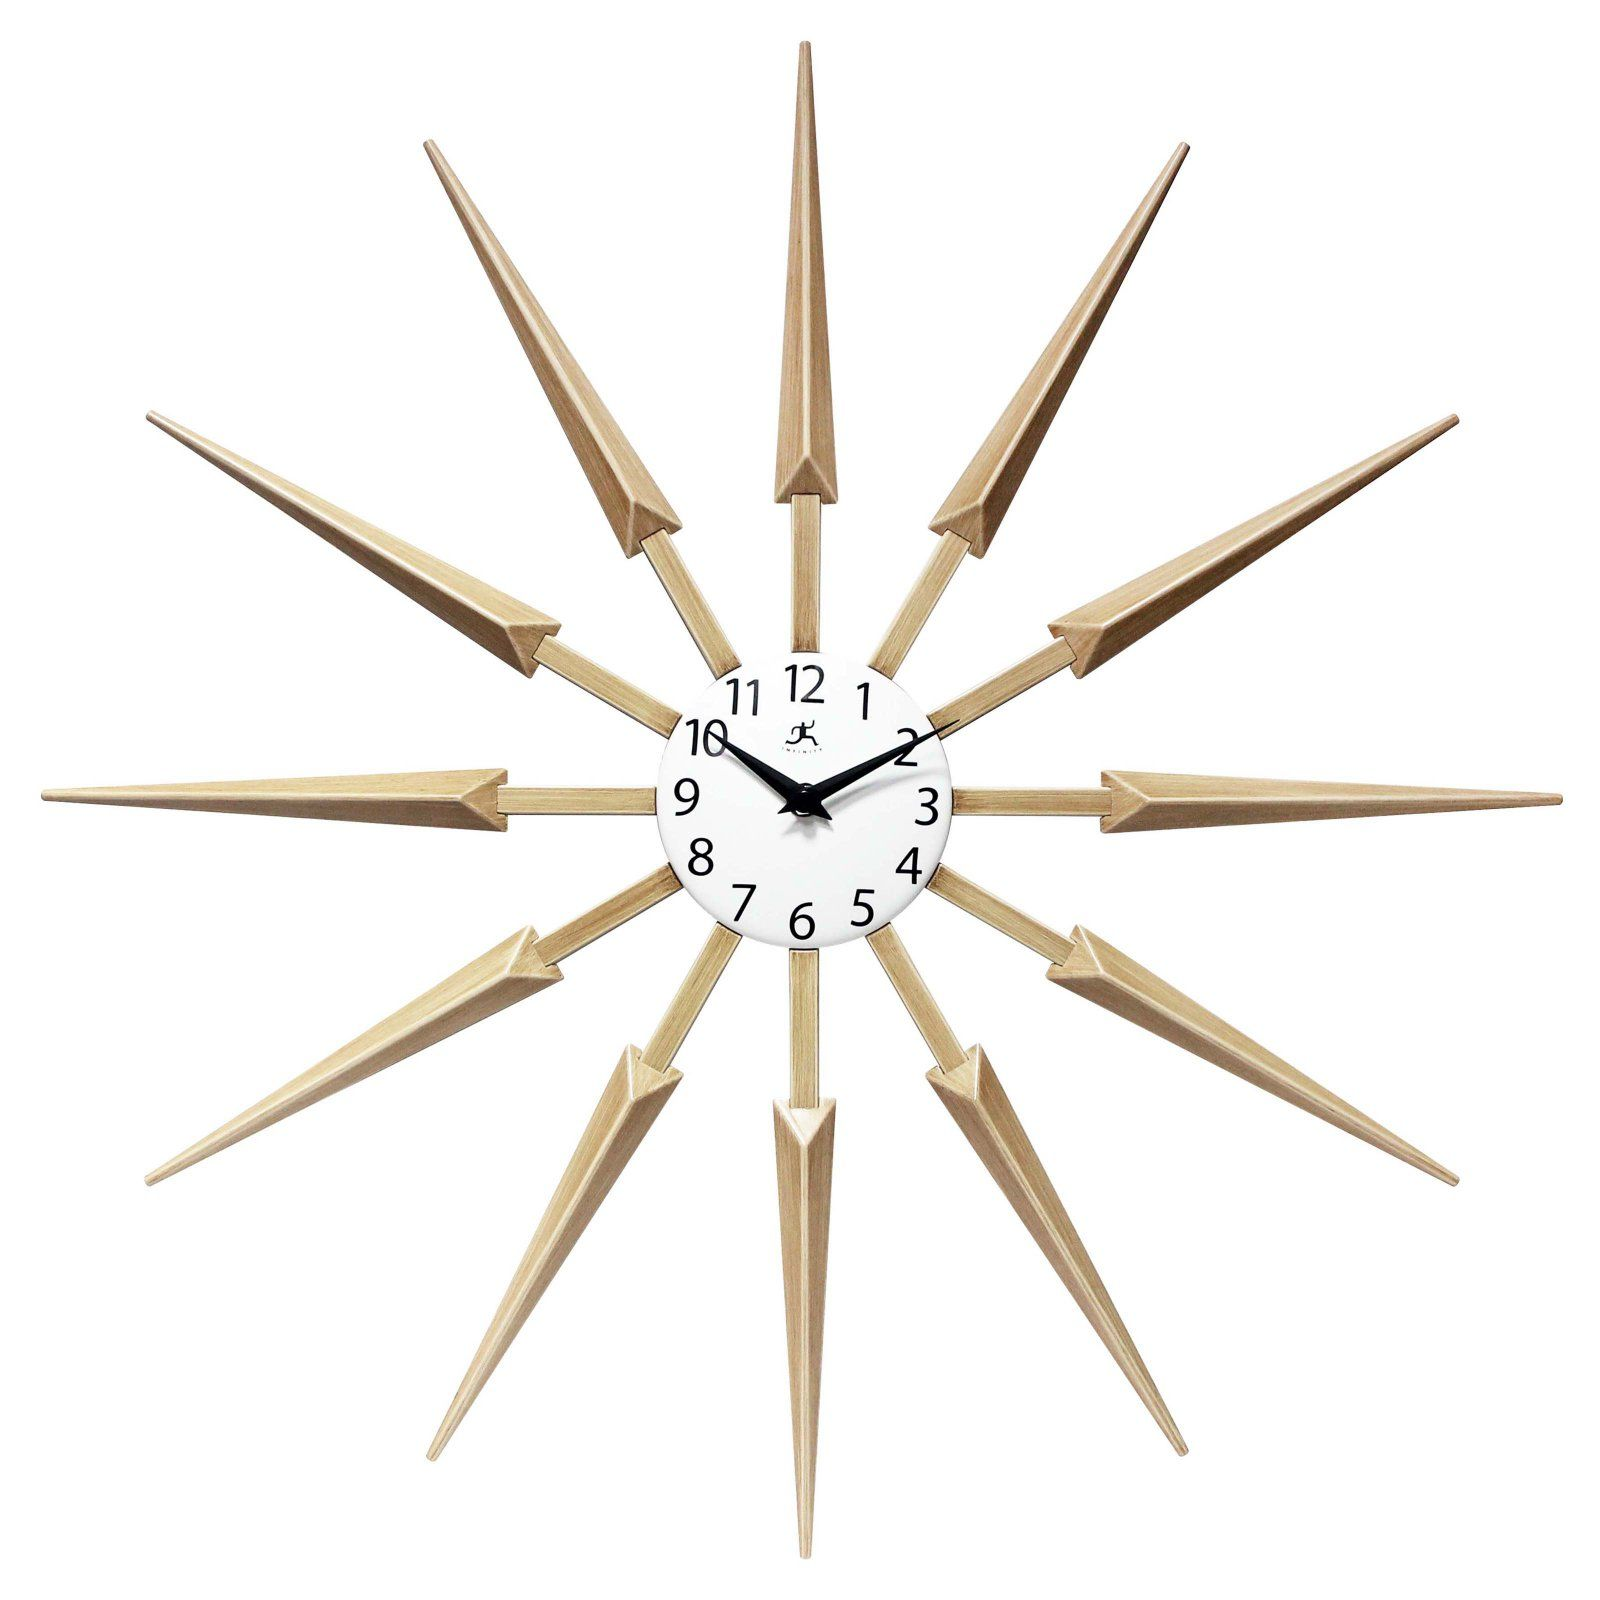 Infinity Instruments Starburst Silhouette Wall Clock Tan Modern Clock Clock 24 Inch Wall Clock